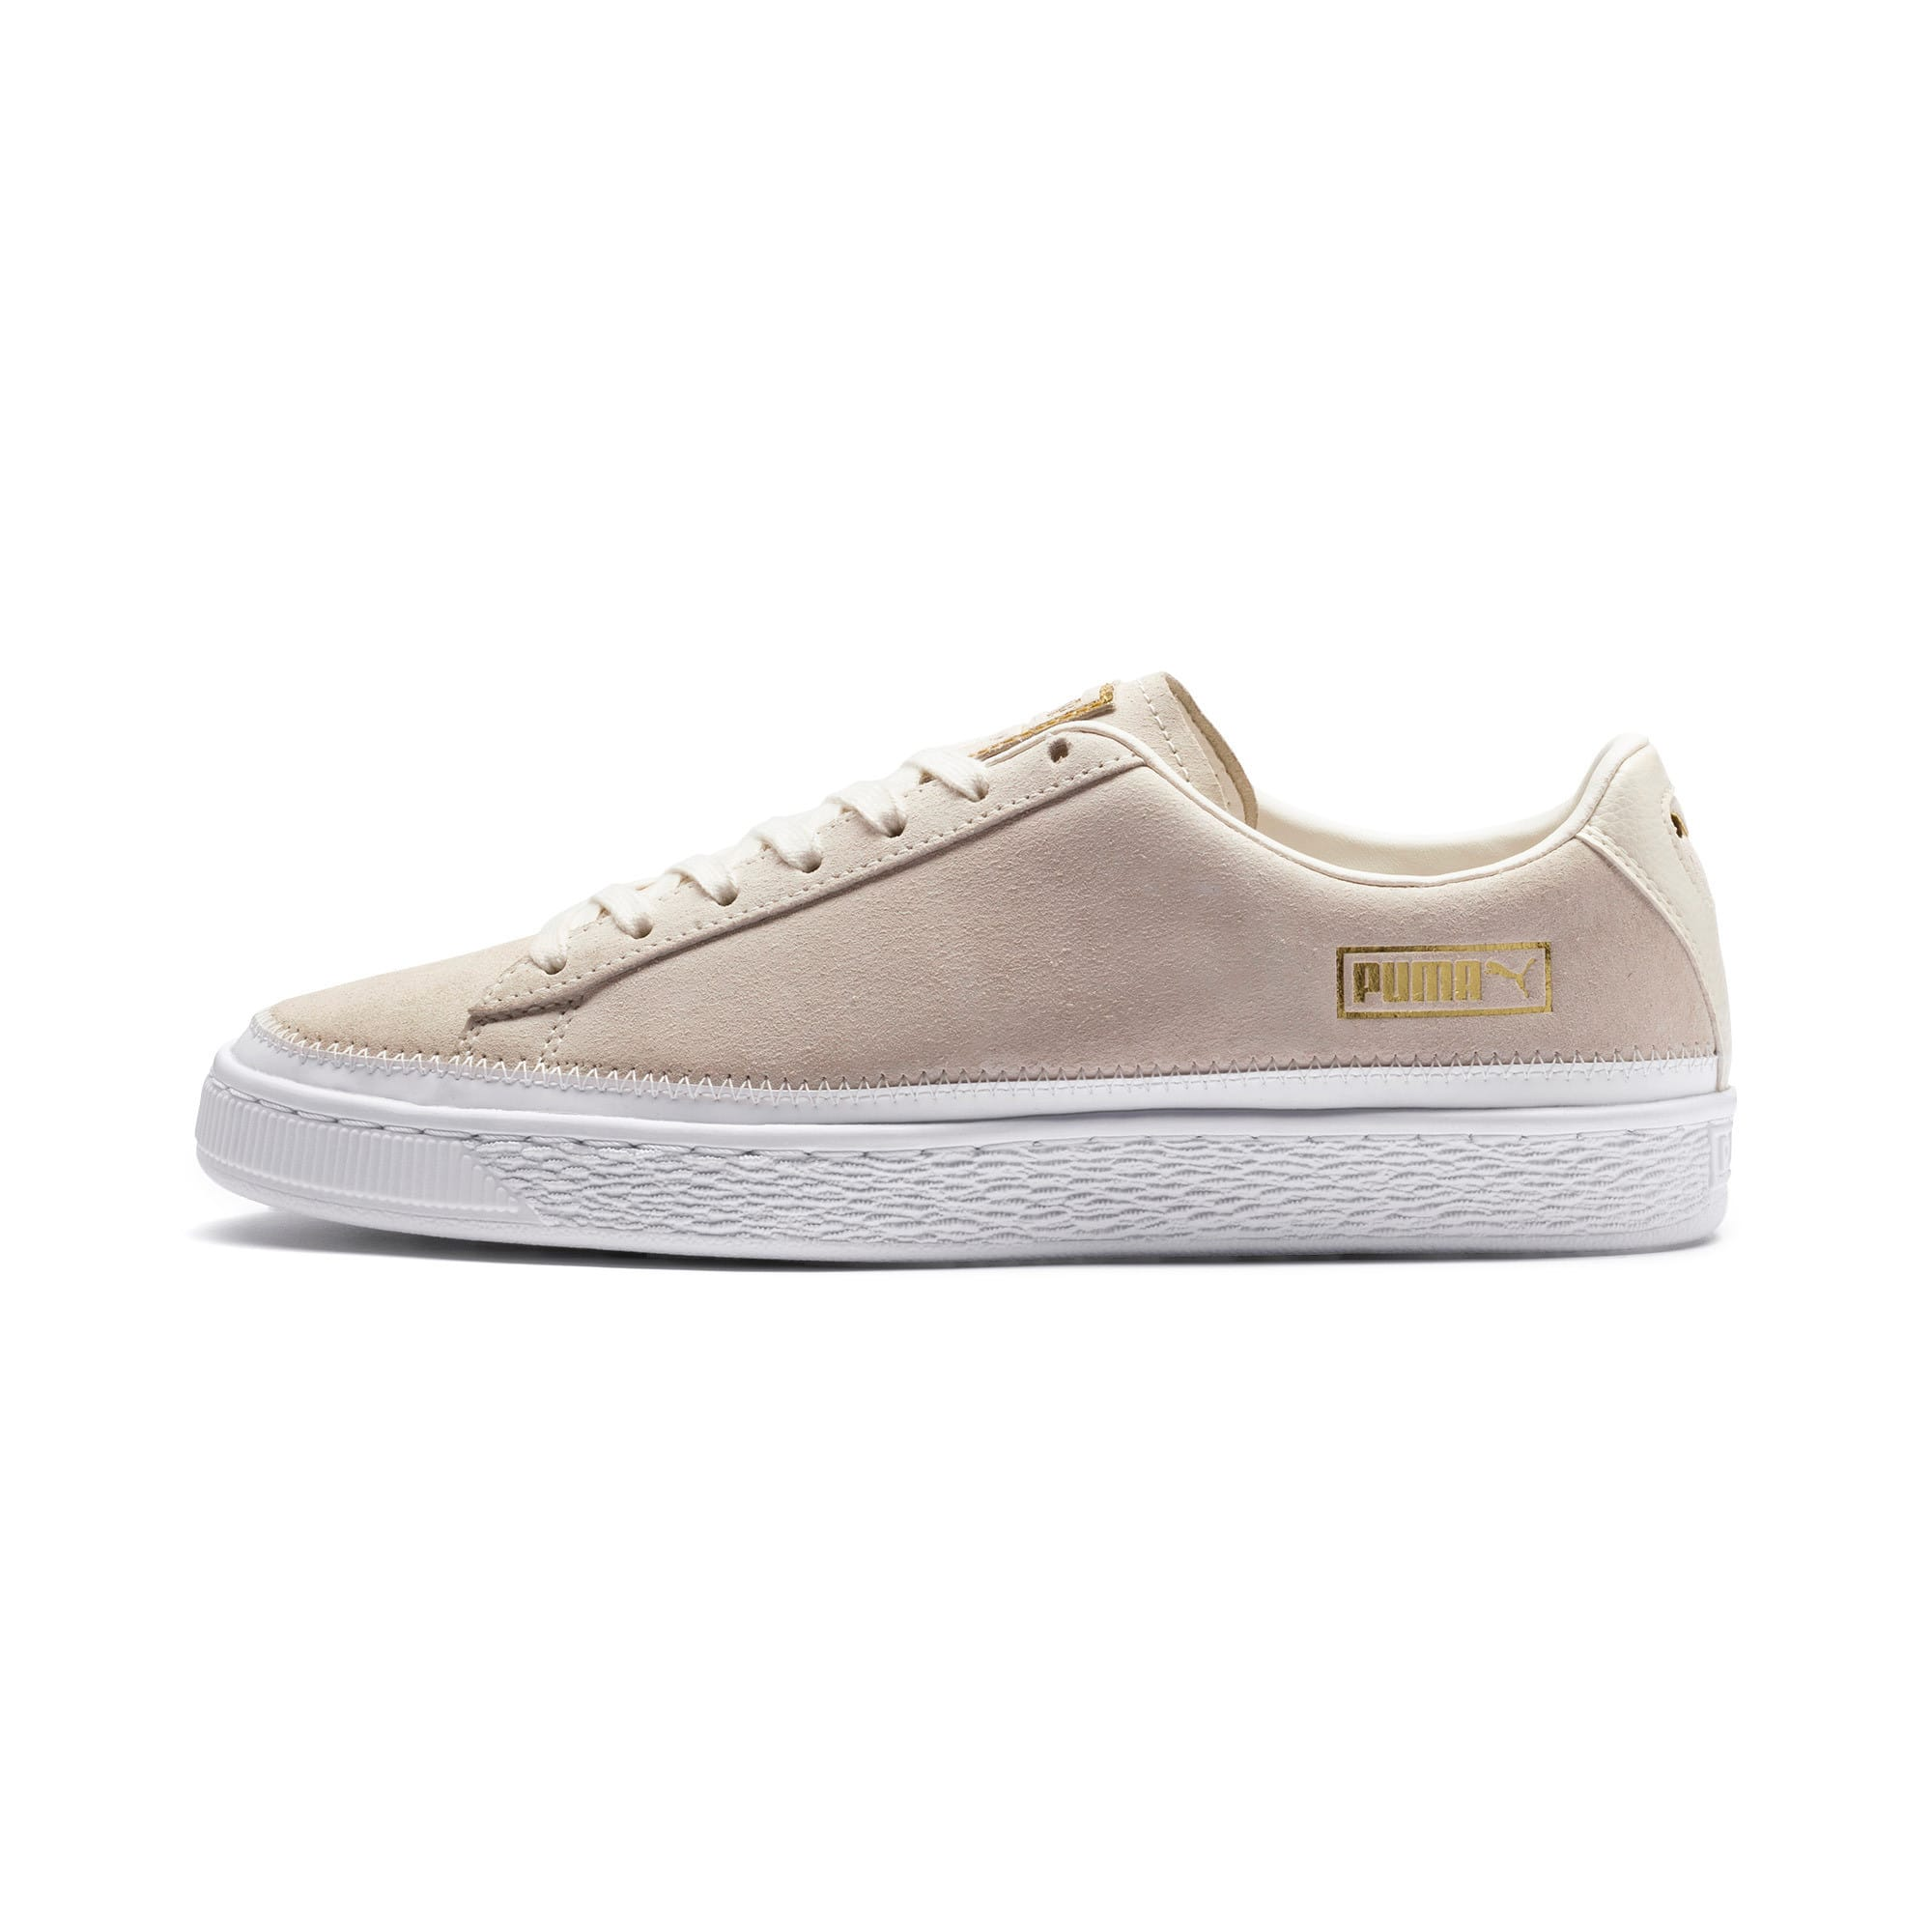 Thumbnail 1 of Suede Trim Sneaker, Whisper White-White- Gold, medium